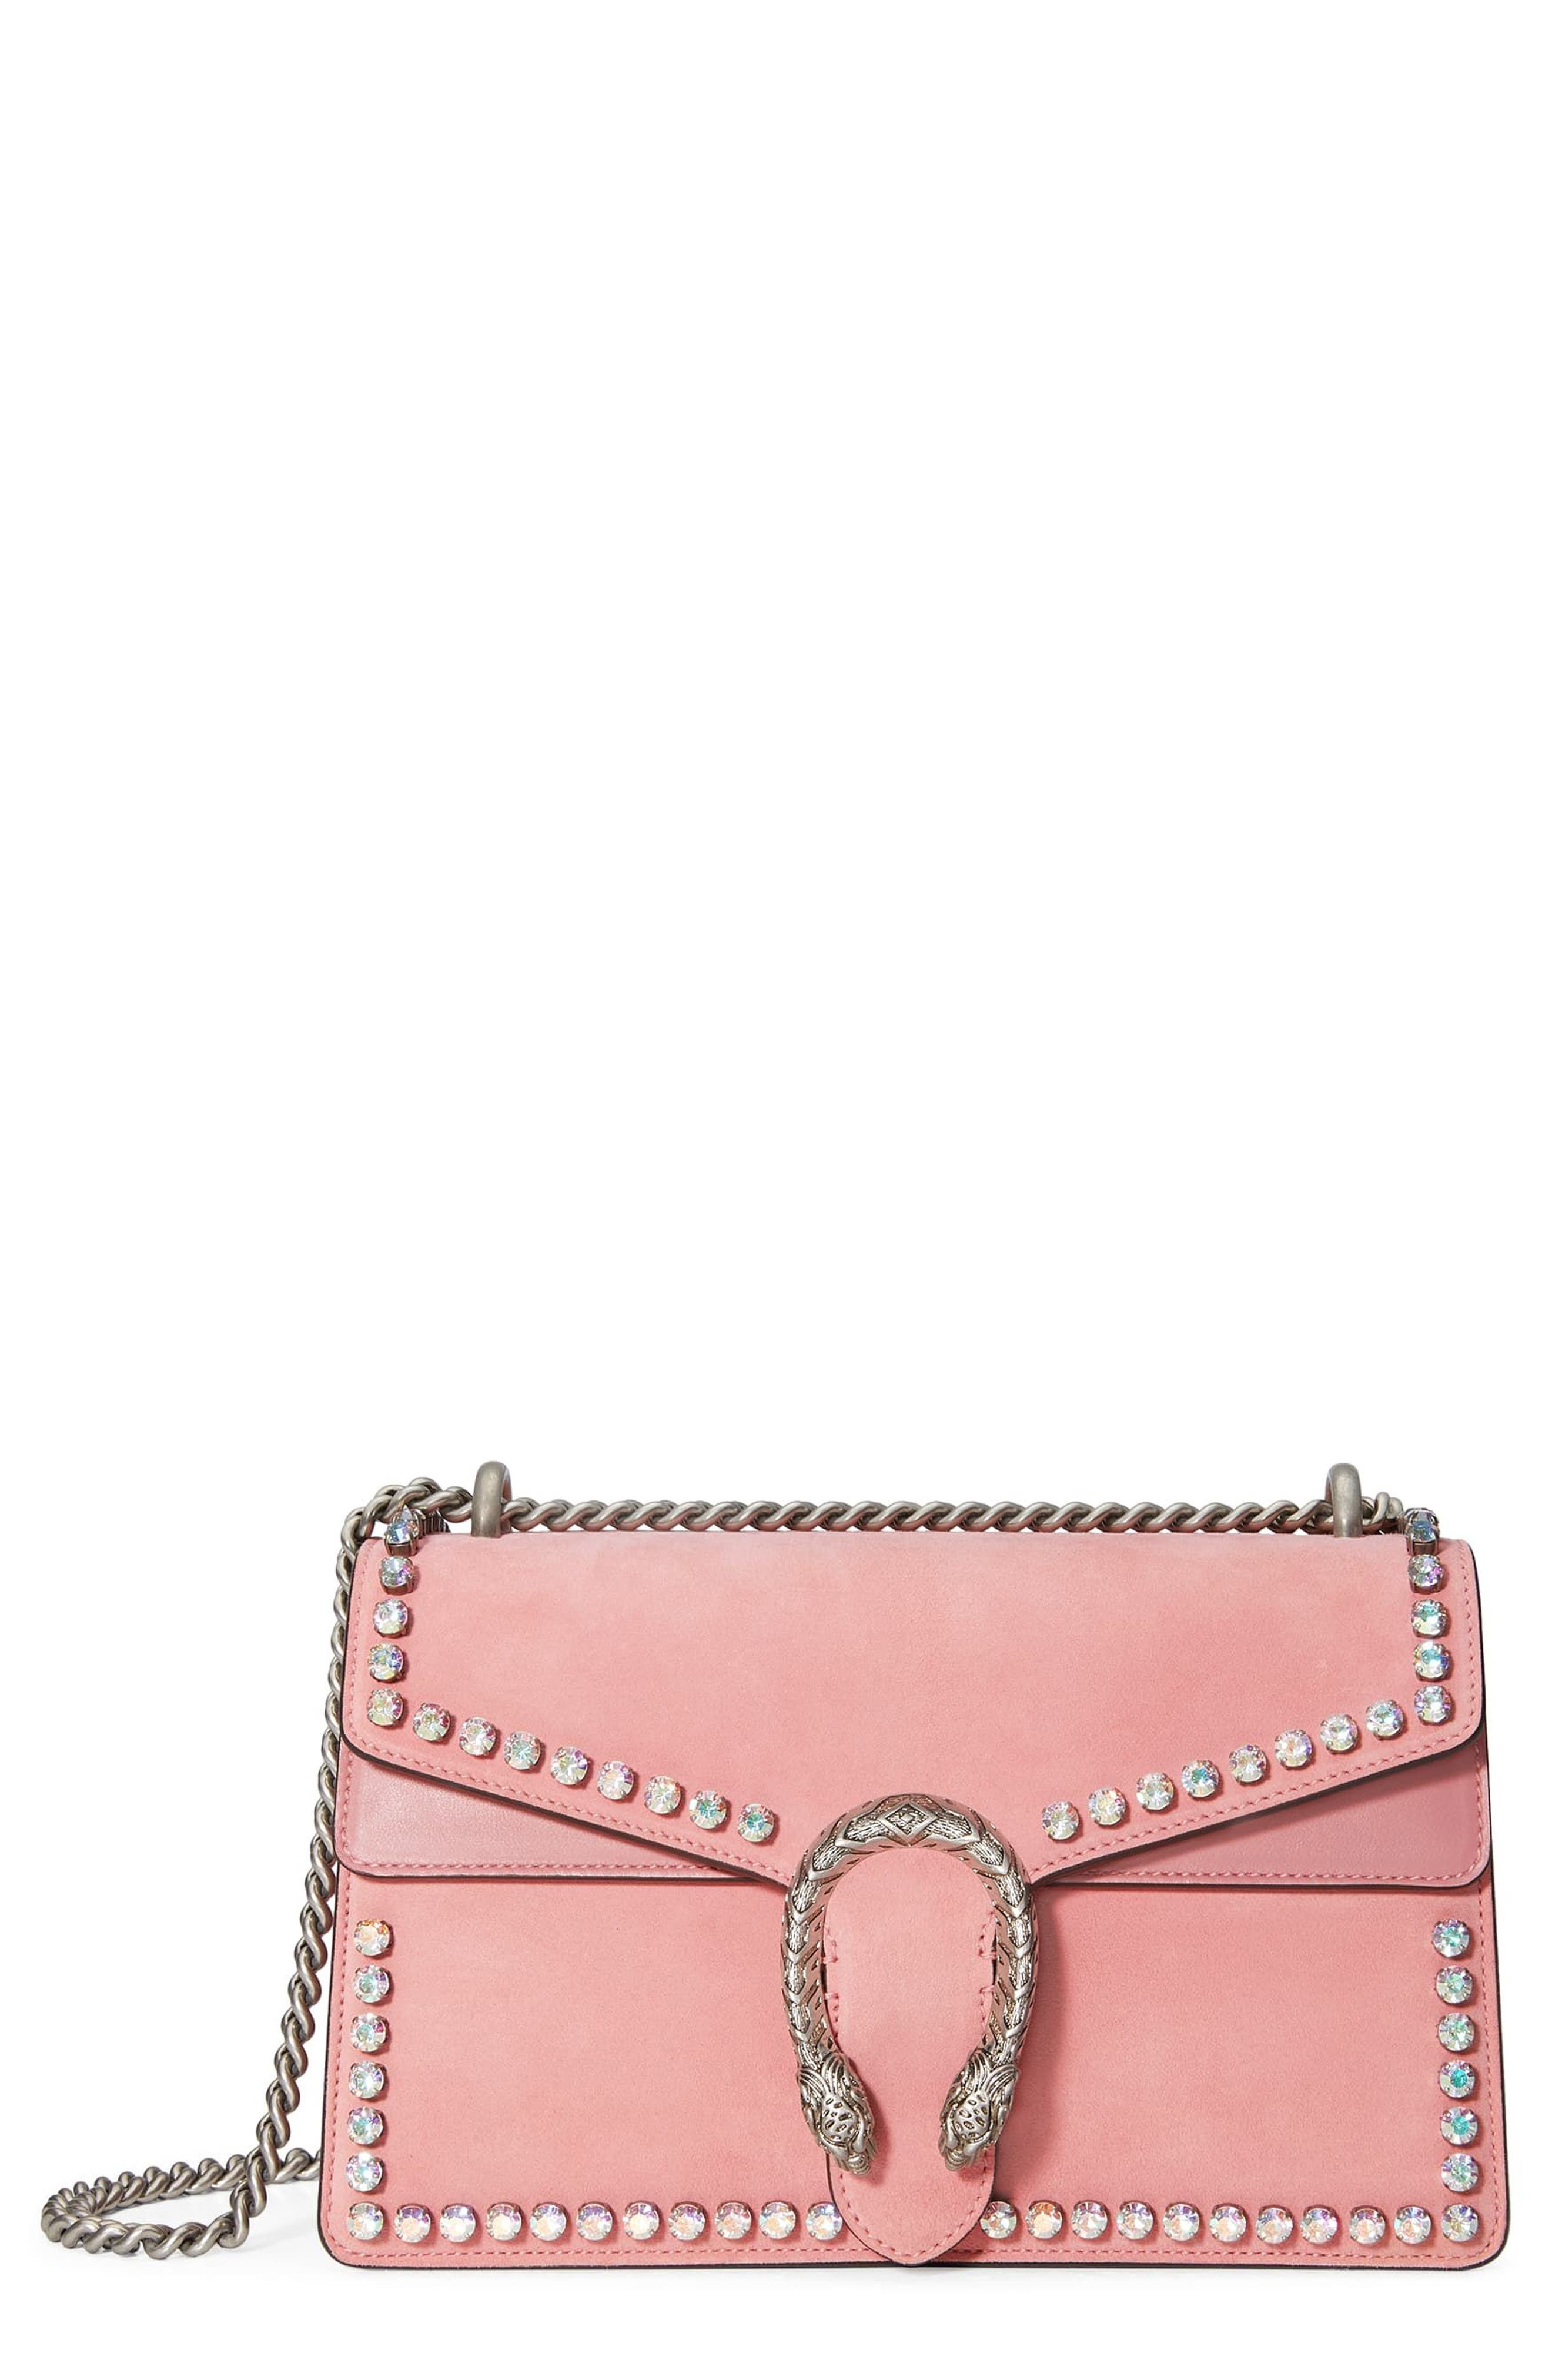 Small Dionysus Crystal Embellished Suede Shoulder Bag,                             Main thumbnail 1, color,                             Pink